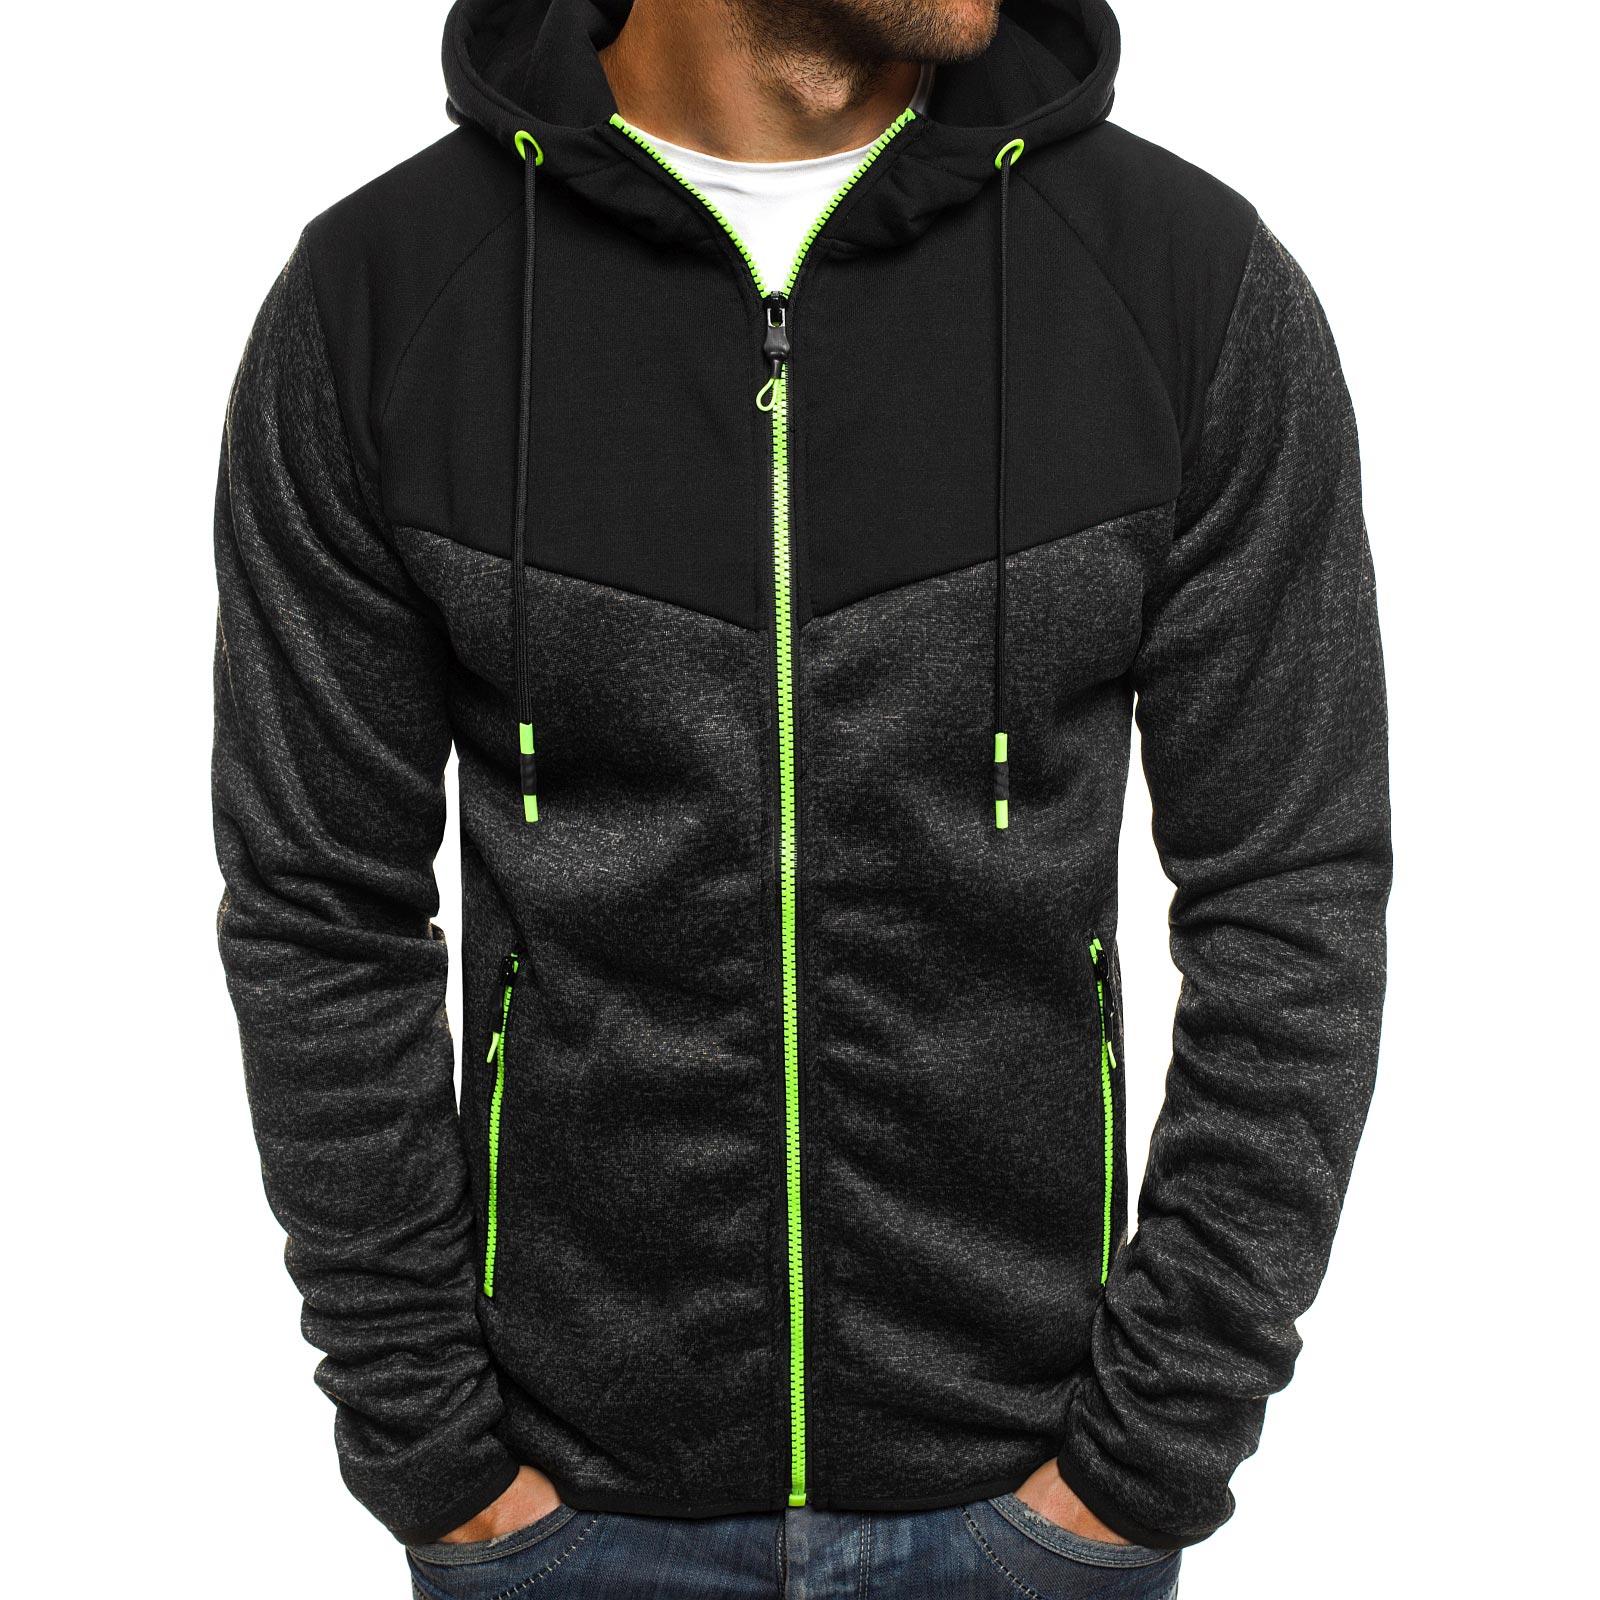 Kapuzenpullover-Sweatshirt-Pullover-Kapuze-Sweatjacke-Herren-OZONEE-J-STYLE-MIX